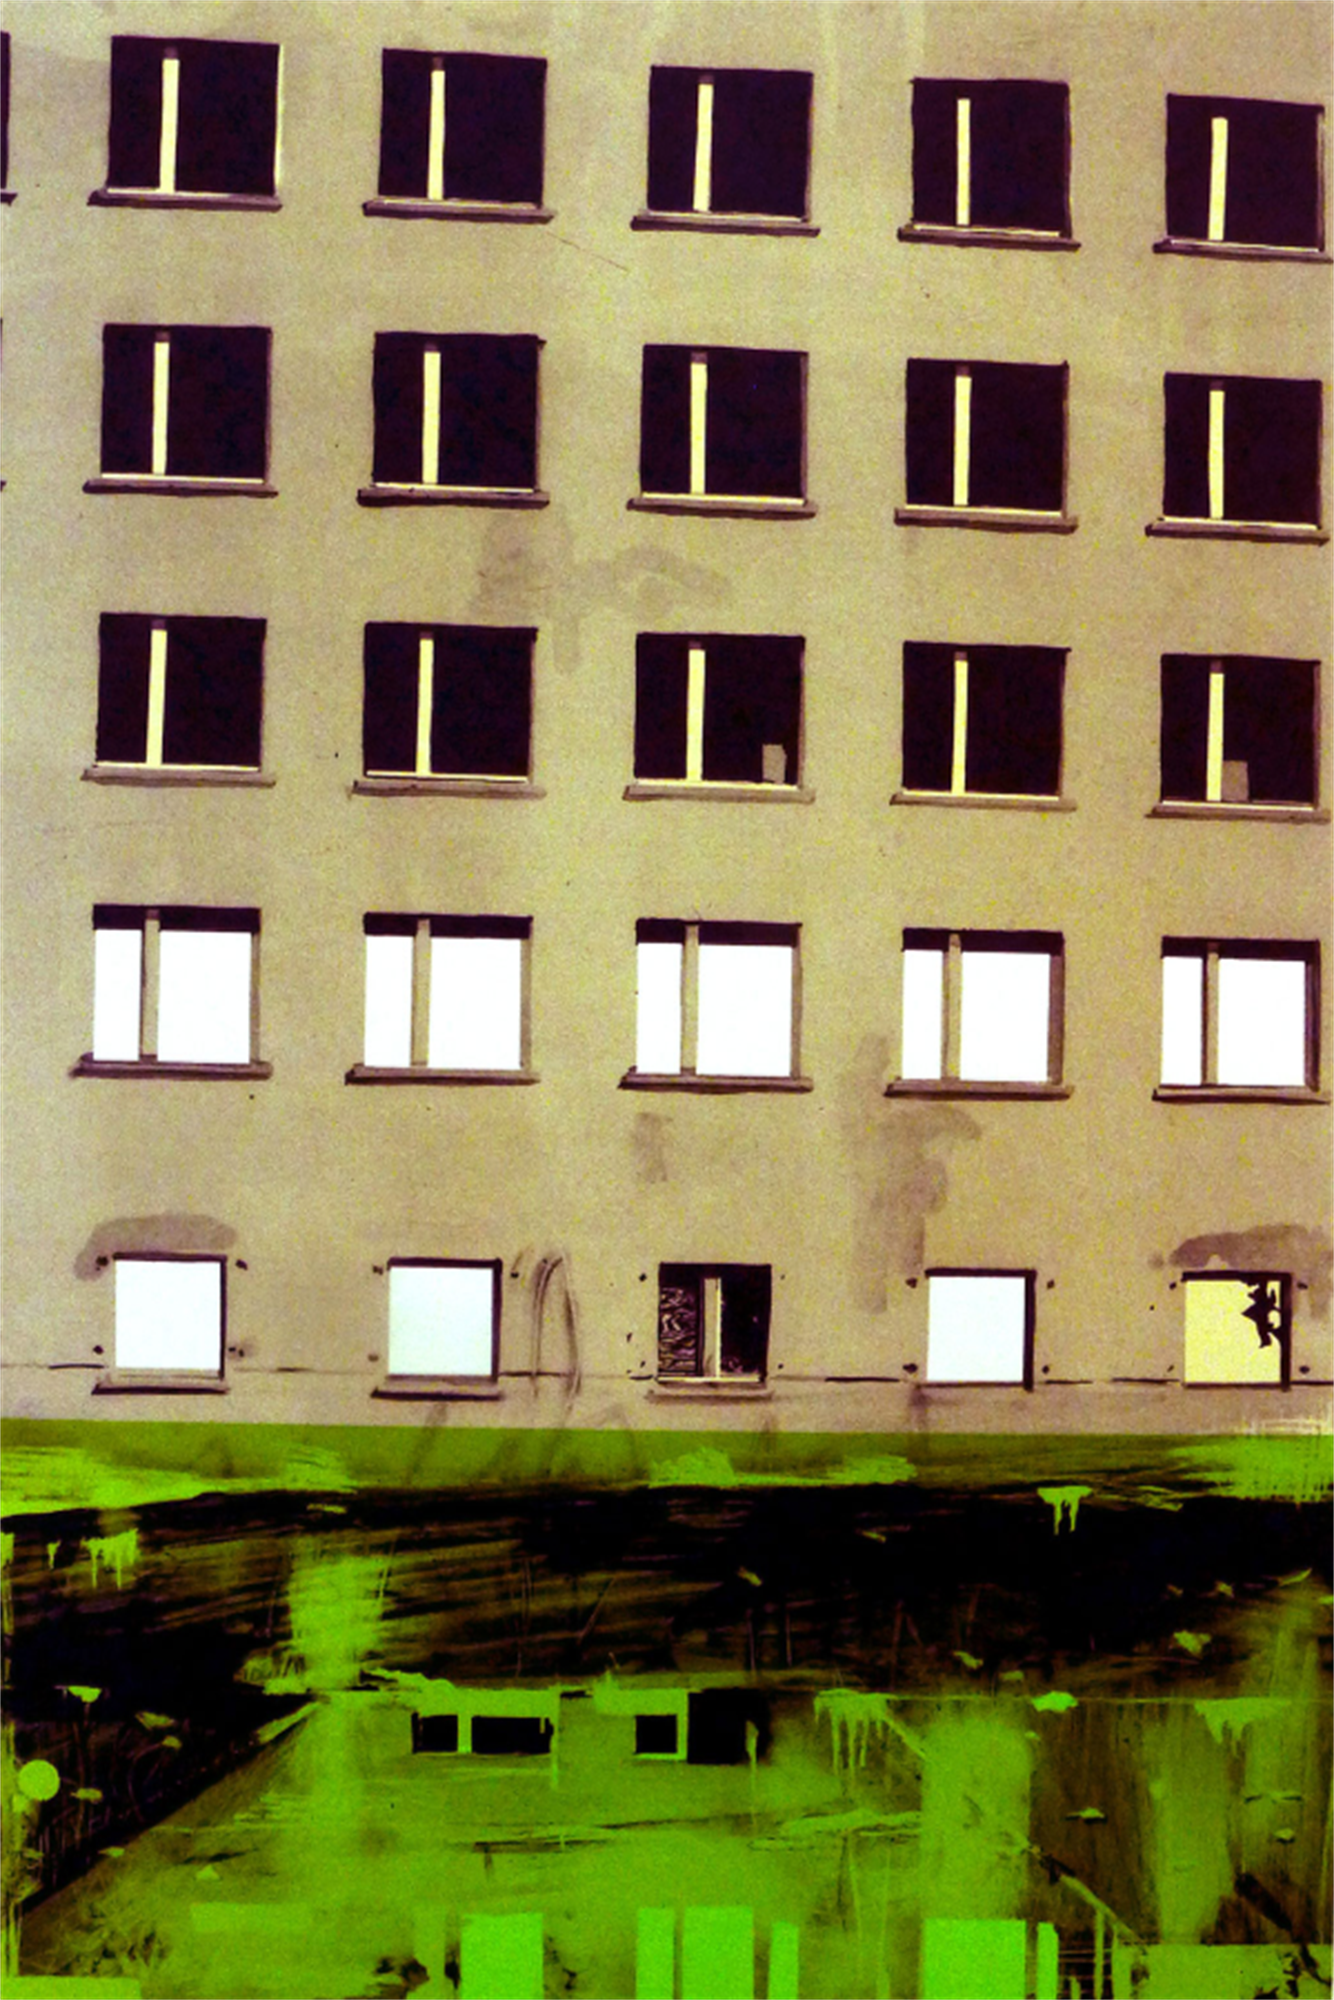 Joakim Allgulander - Prora Inn, colour lithograpg